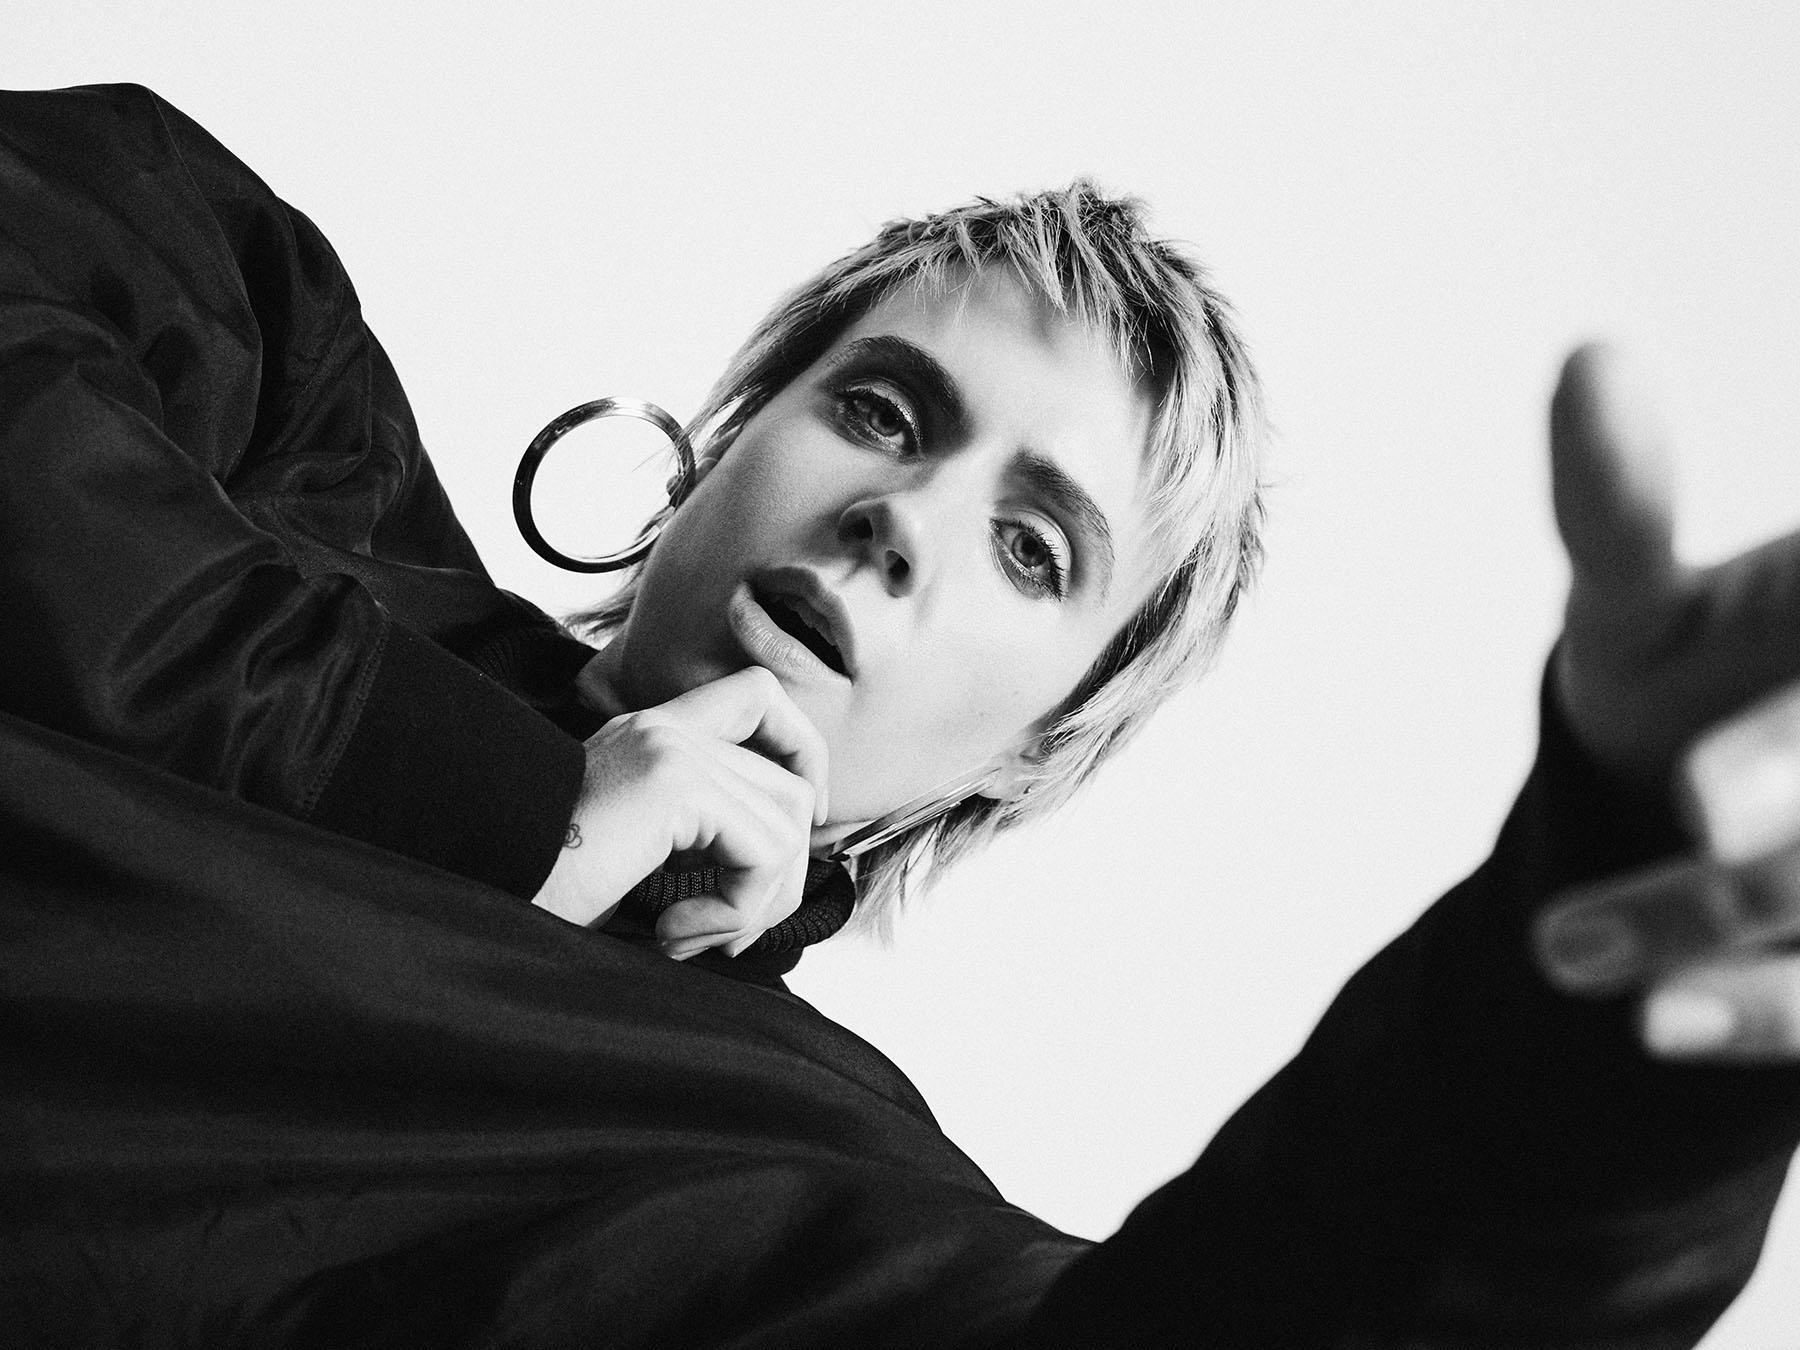 Meet MØ, the Danish Electro-Pop Sensation with a Punk Heart